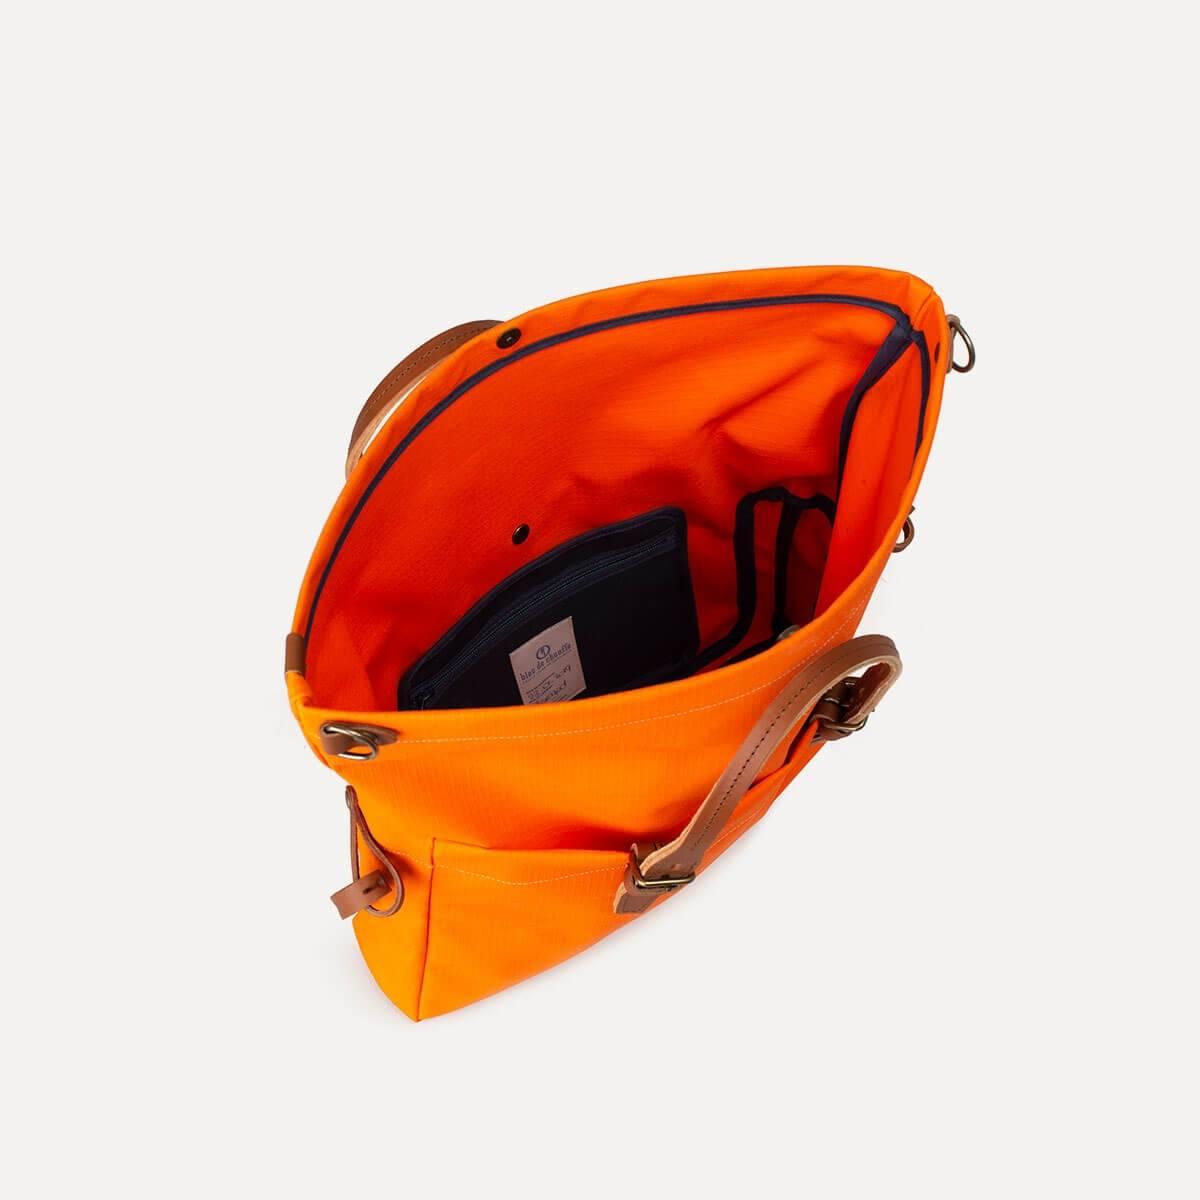 Remix business bag - Regentex Orange (image n°6)